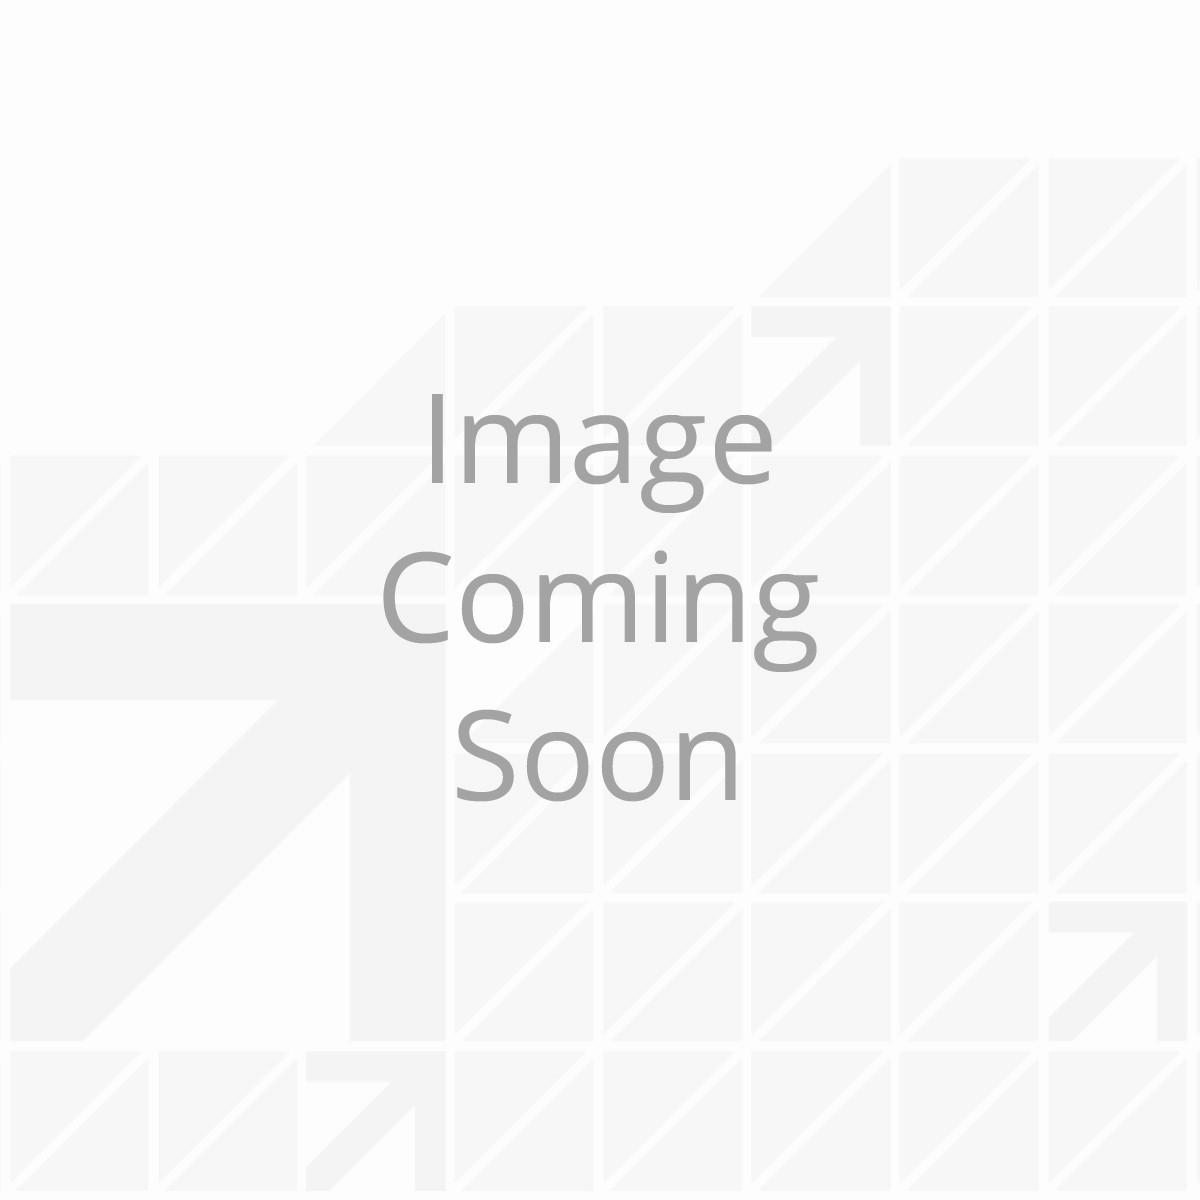 Coaxial TV Cable - 12' (Titanium Grey)